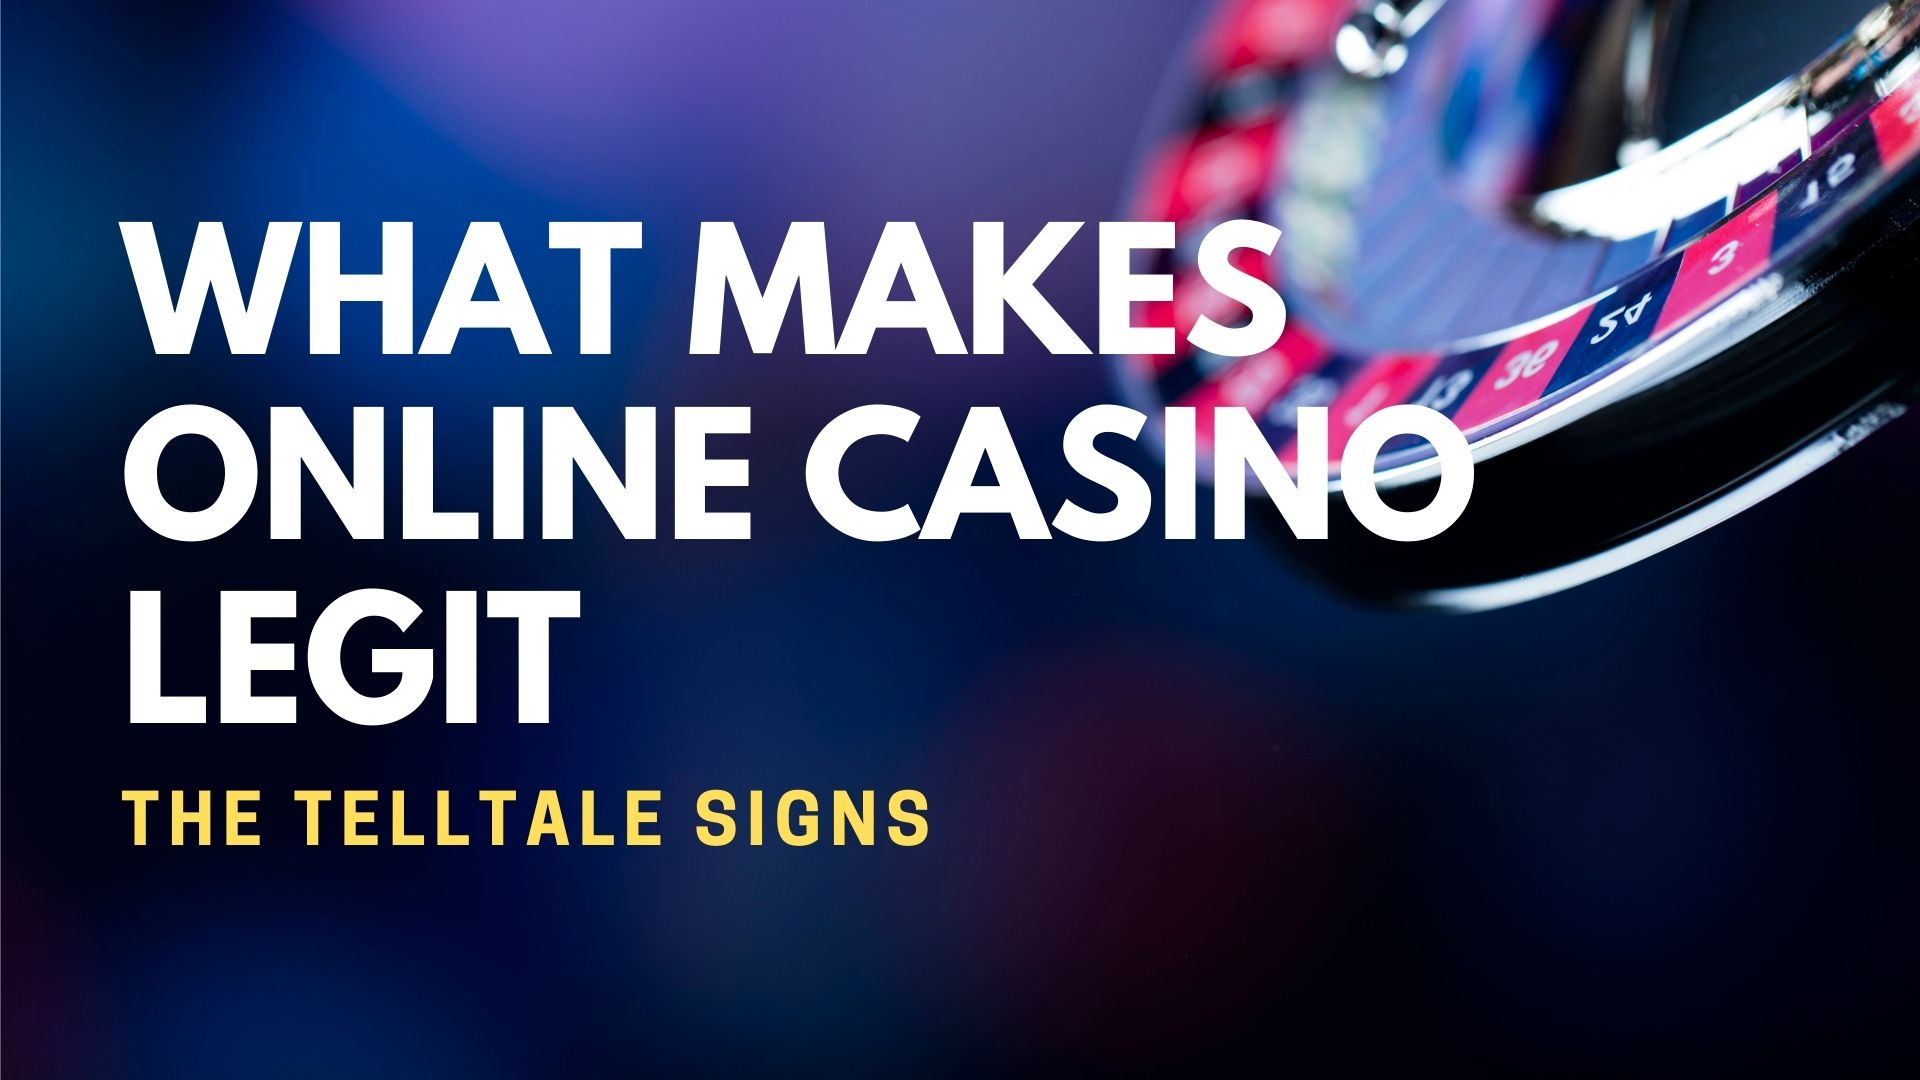 What Makes Online Casino Legit The Telltale Signs